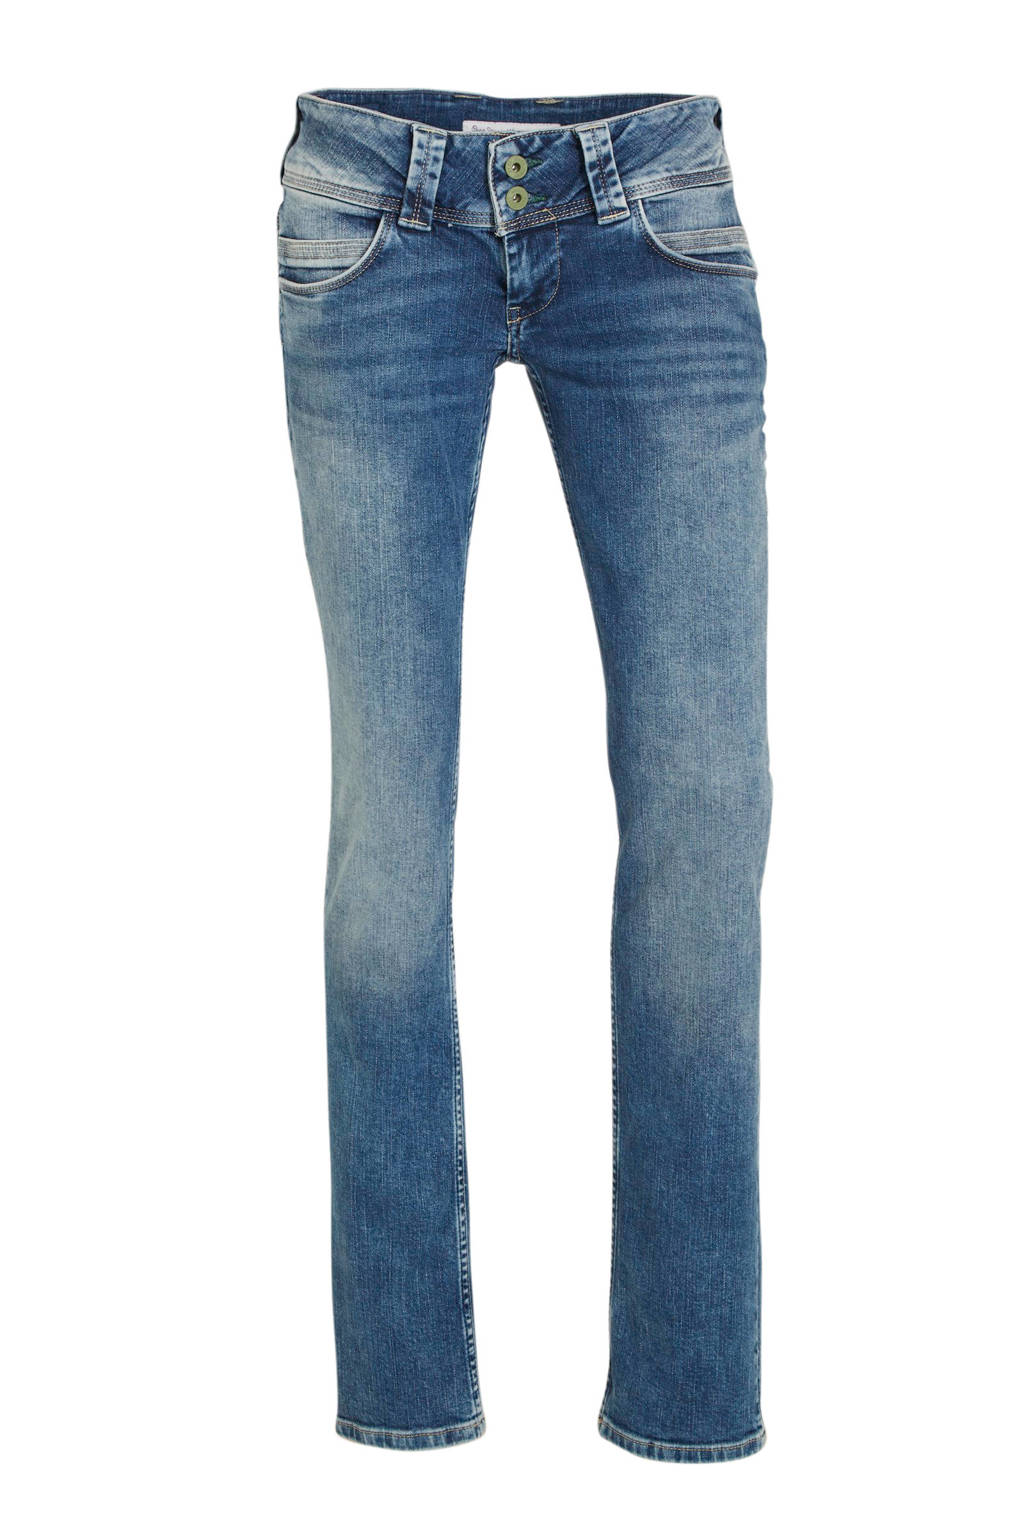 Pepe Jeans low waist straight fit jeans Venus blauw, Blauw